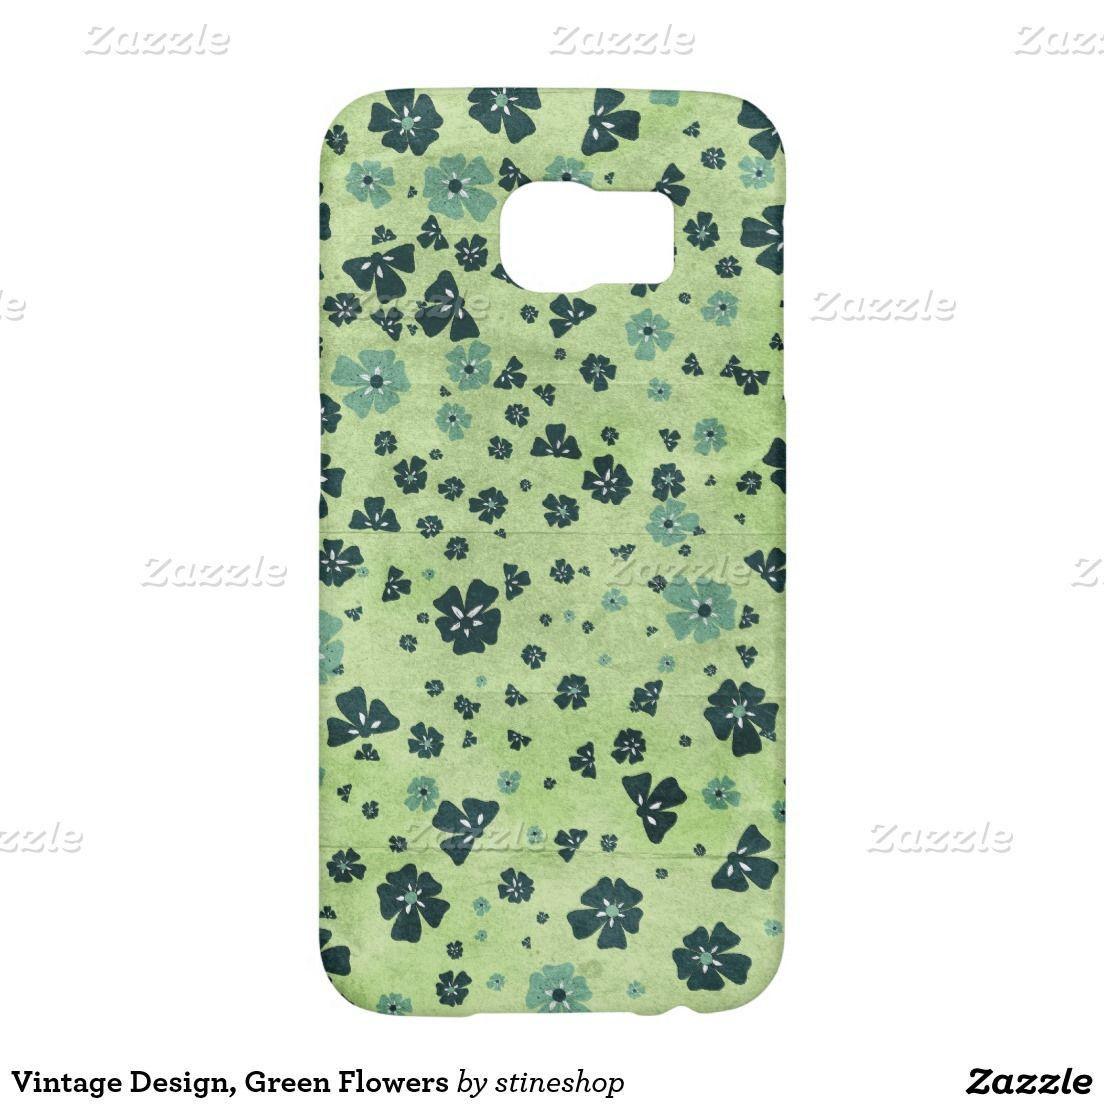 Vintage Design, Green Flowers Samsung Galaxy S6 Cases